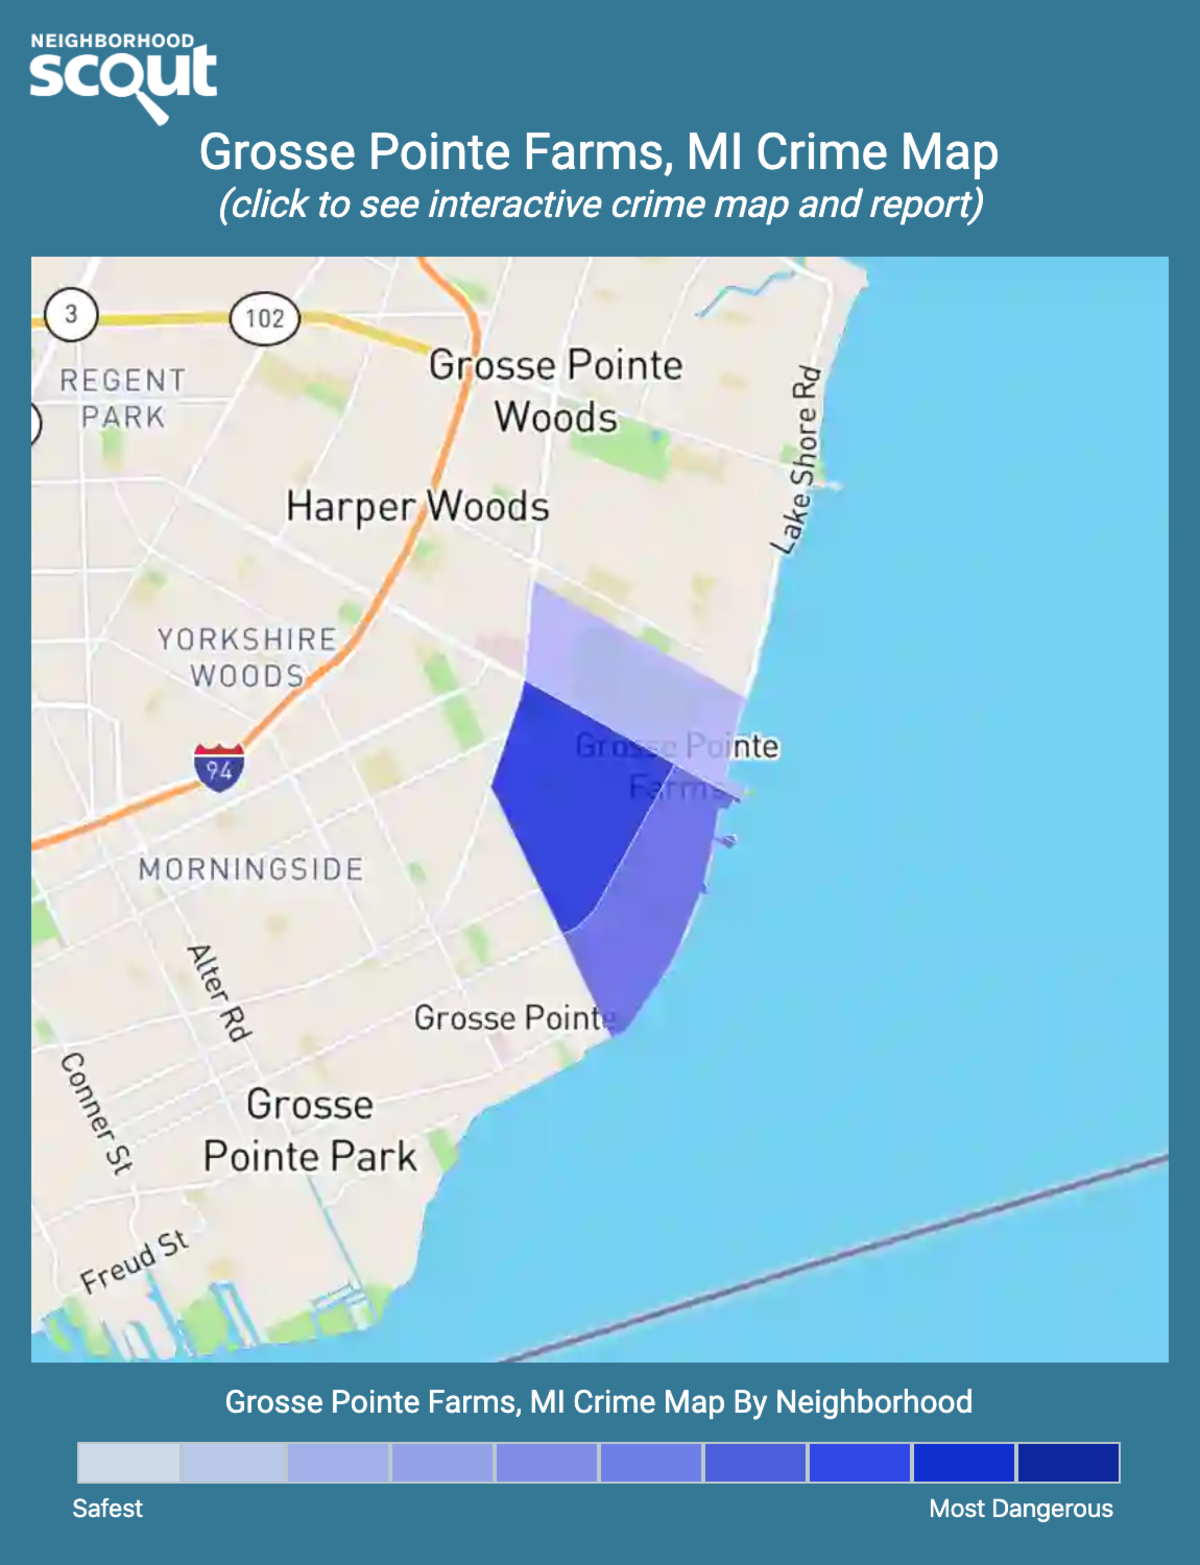 Grosse Pointe Farms, Michigan crime map